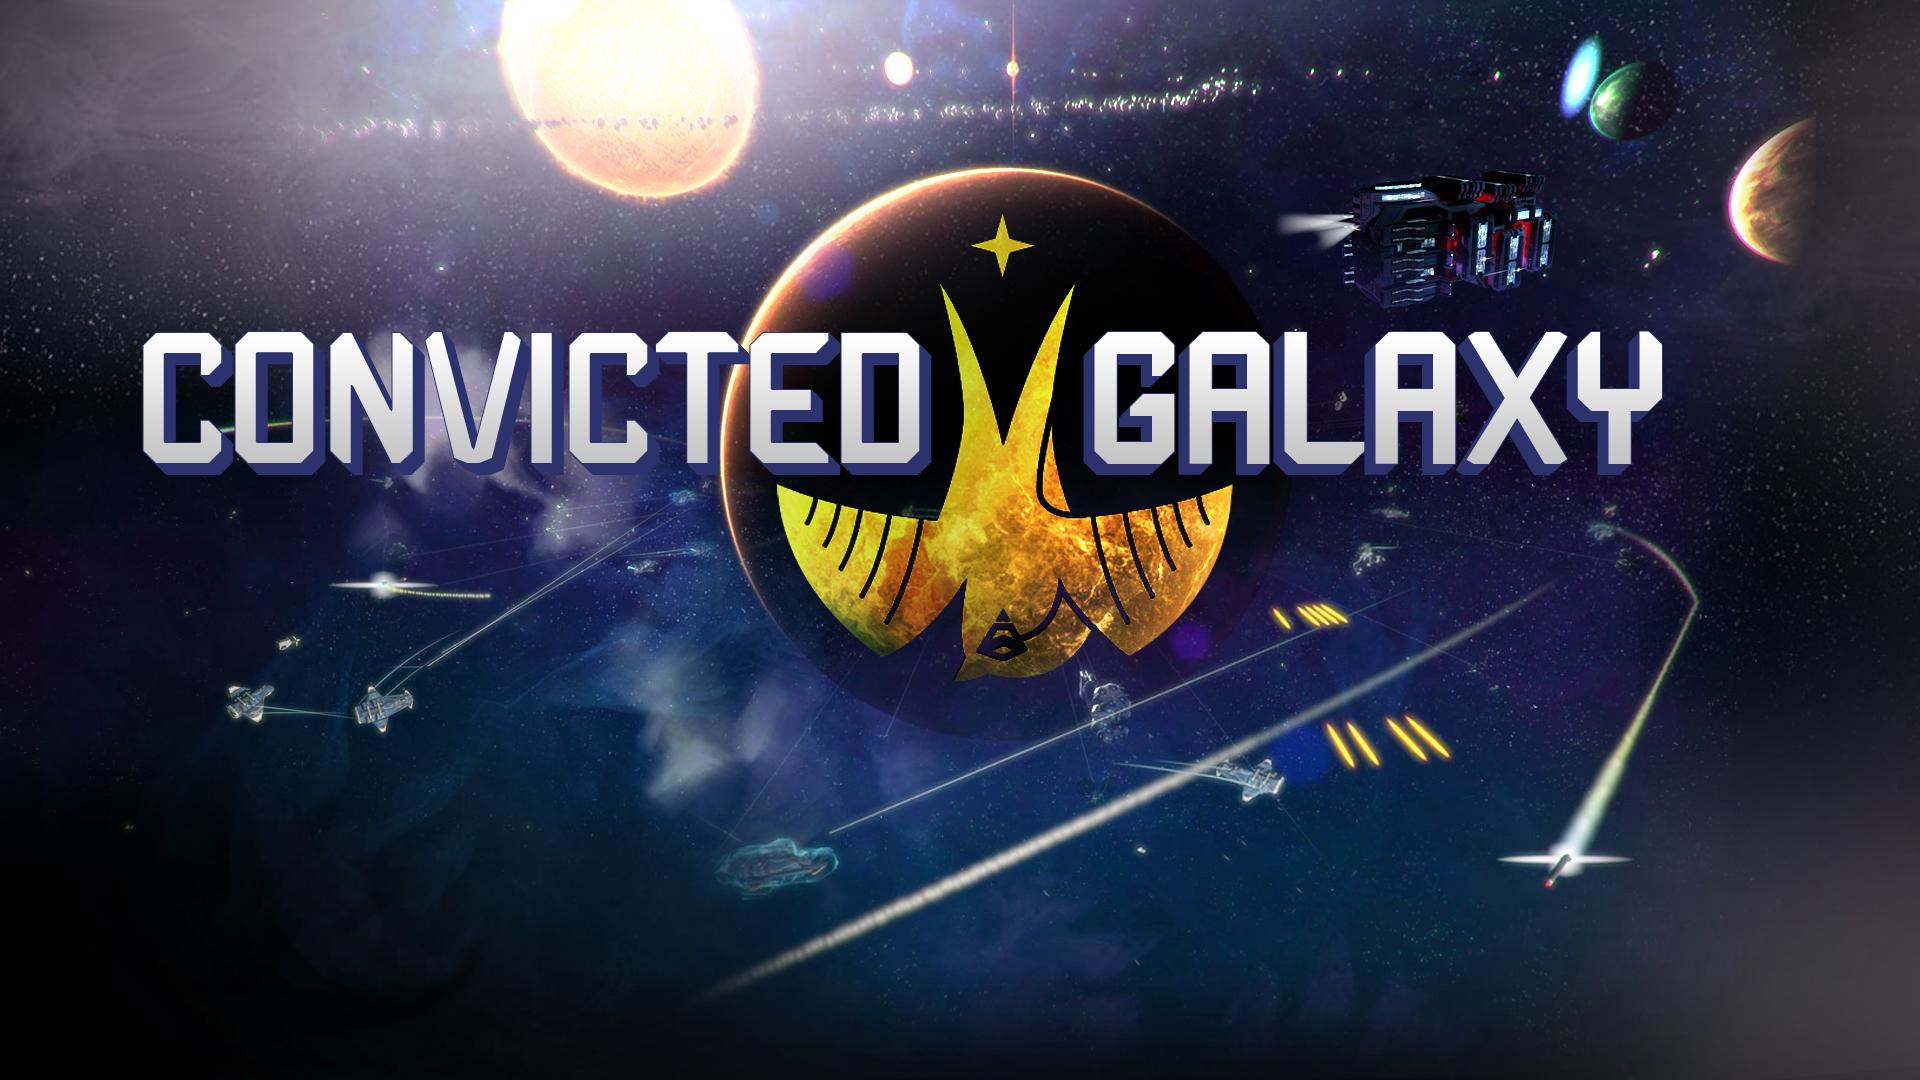 Convicted Galaxy Image